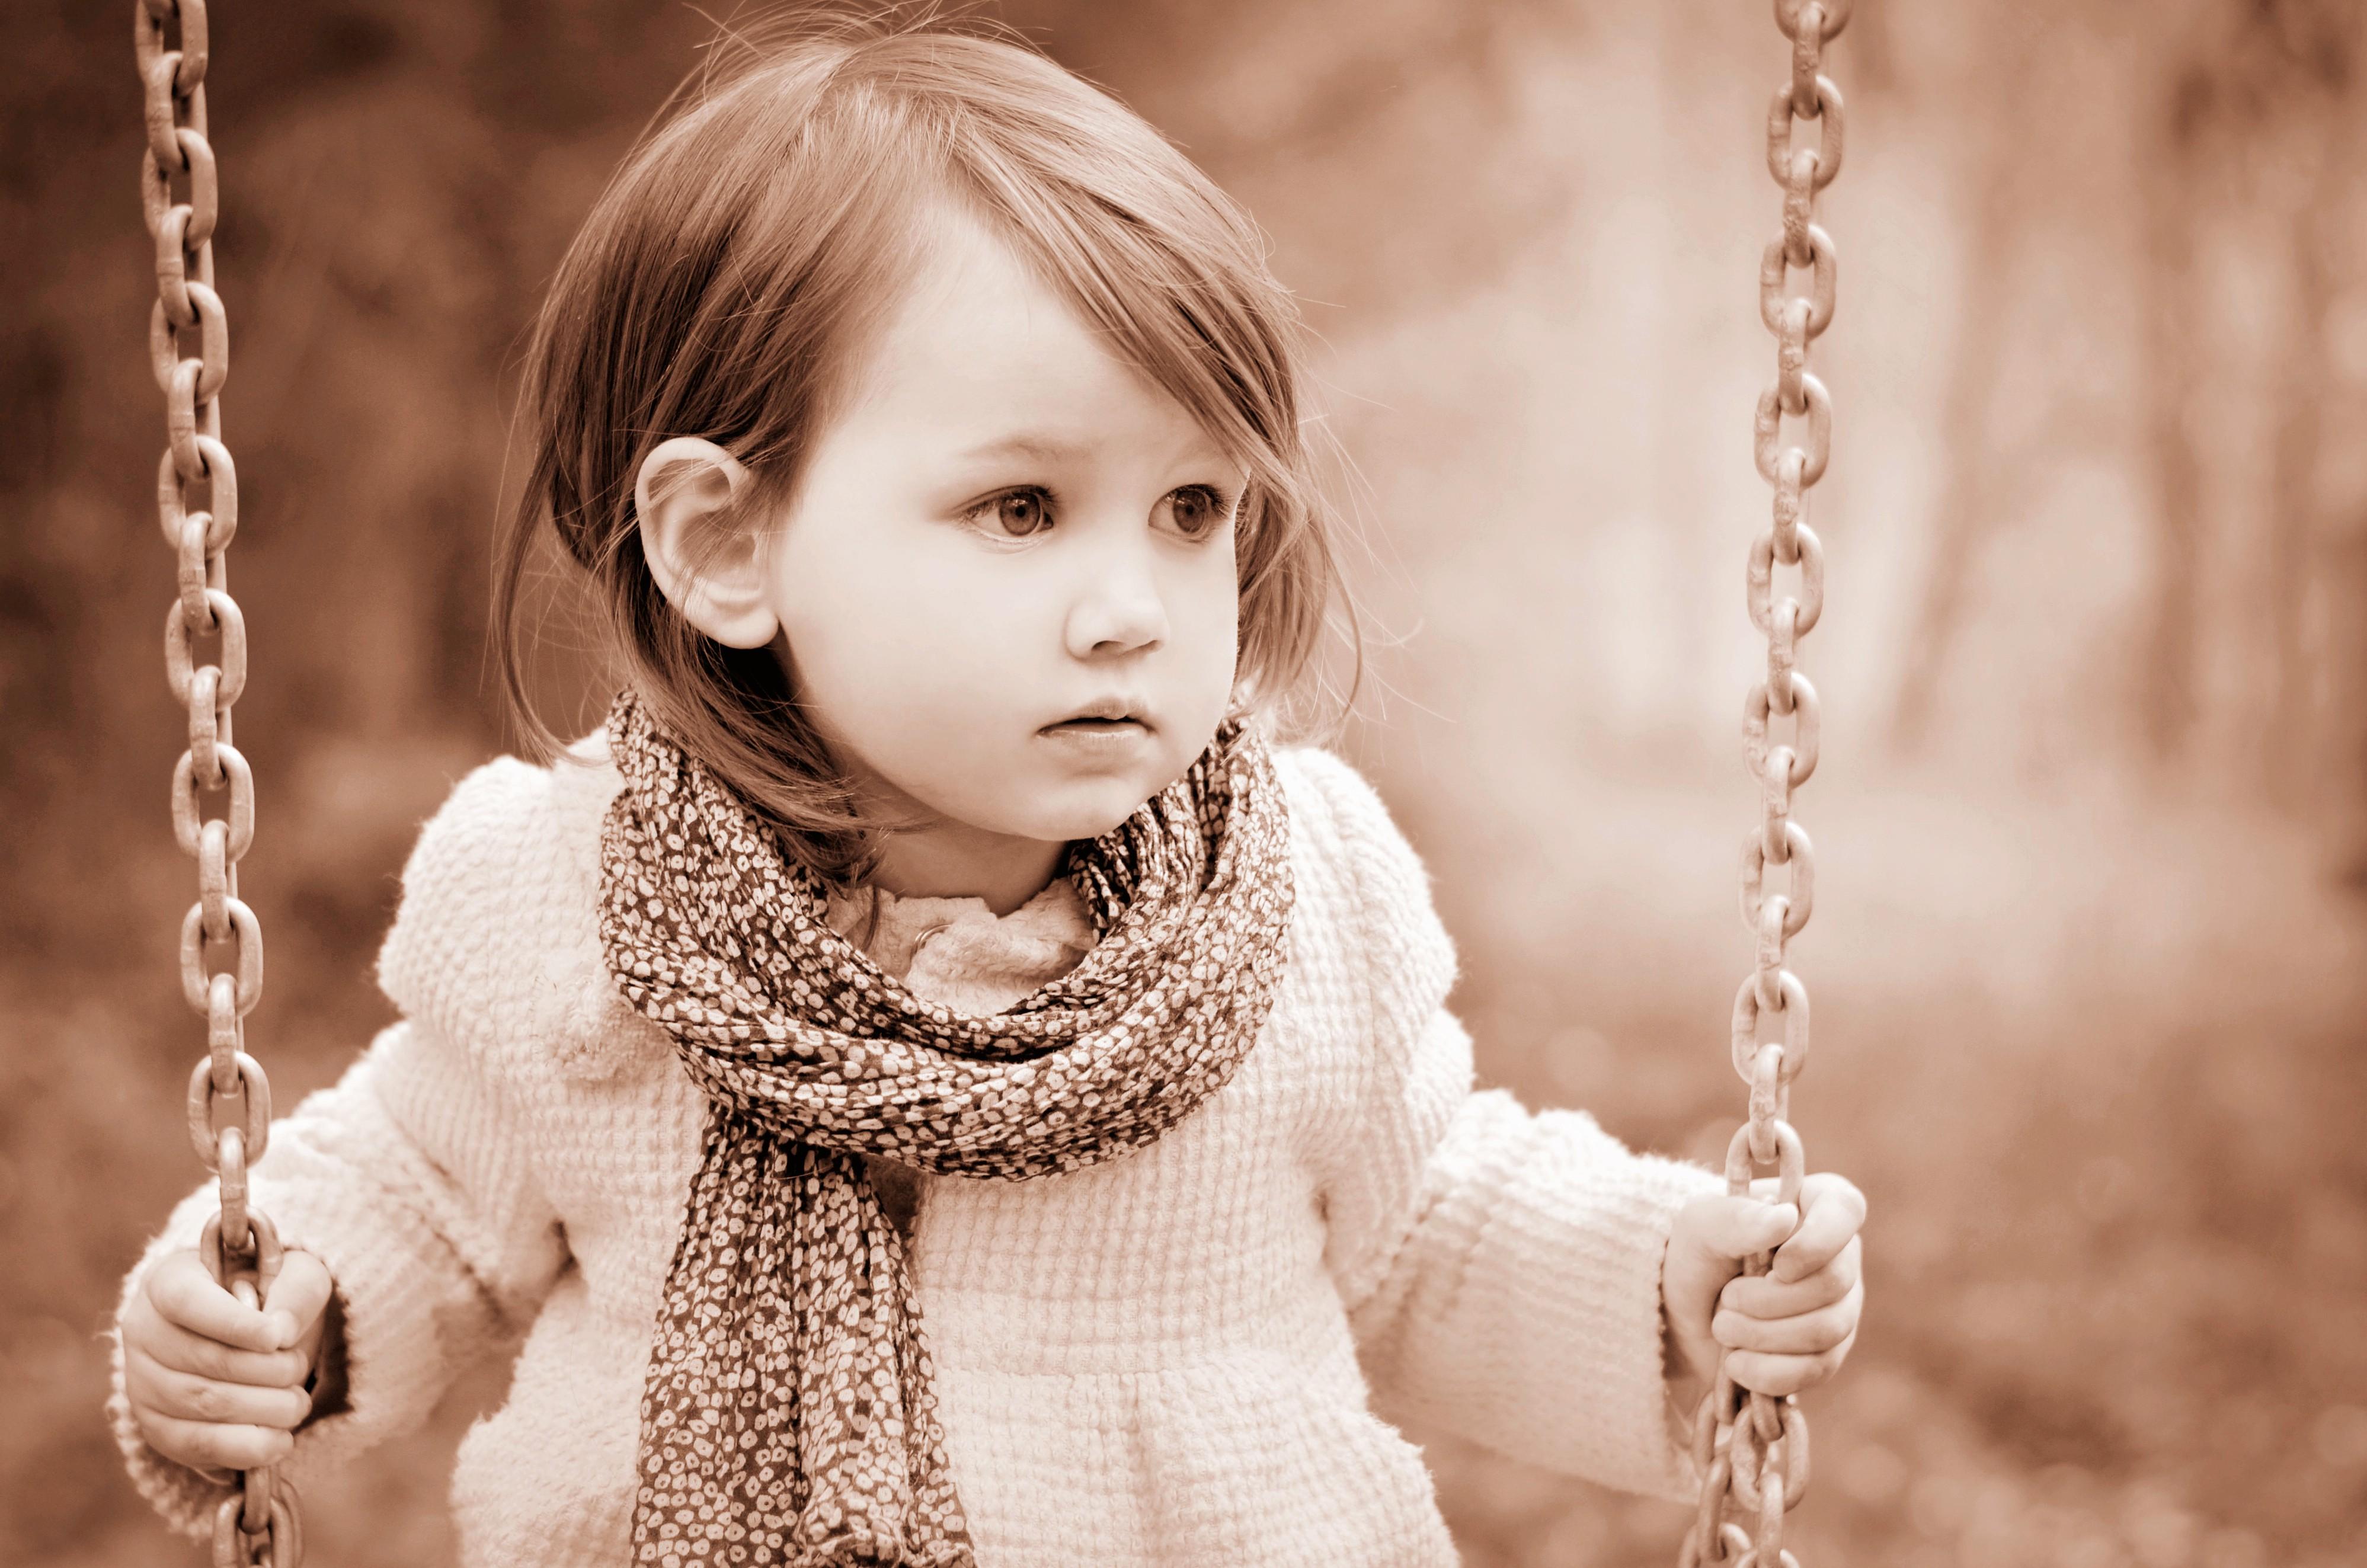 Cute Baby Girl Swing HD Wallpapers   New HD Wallpapers 3994x2646